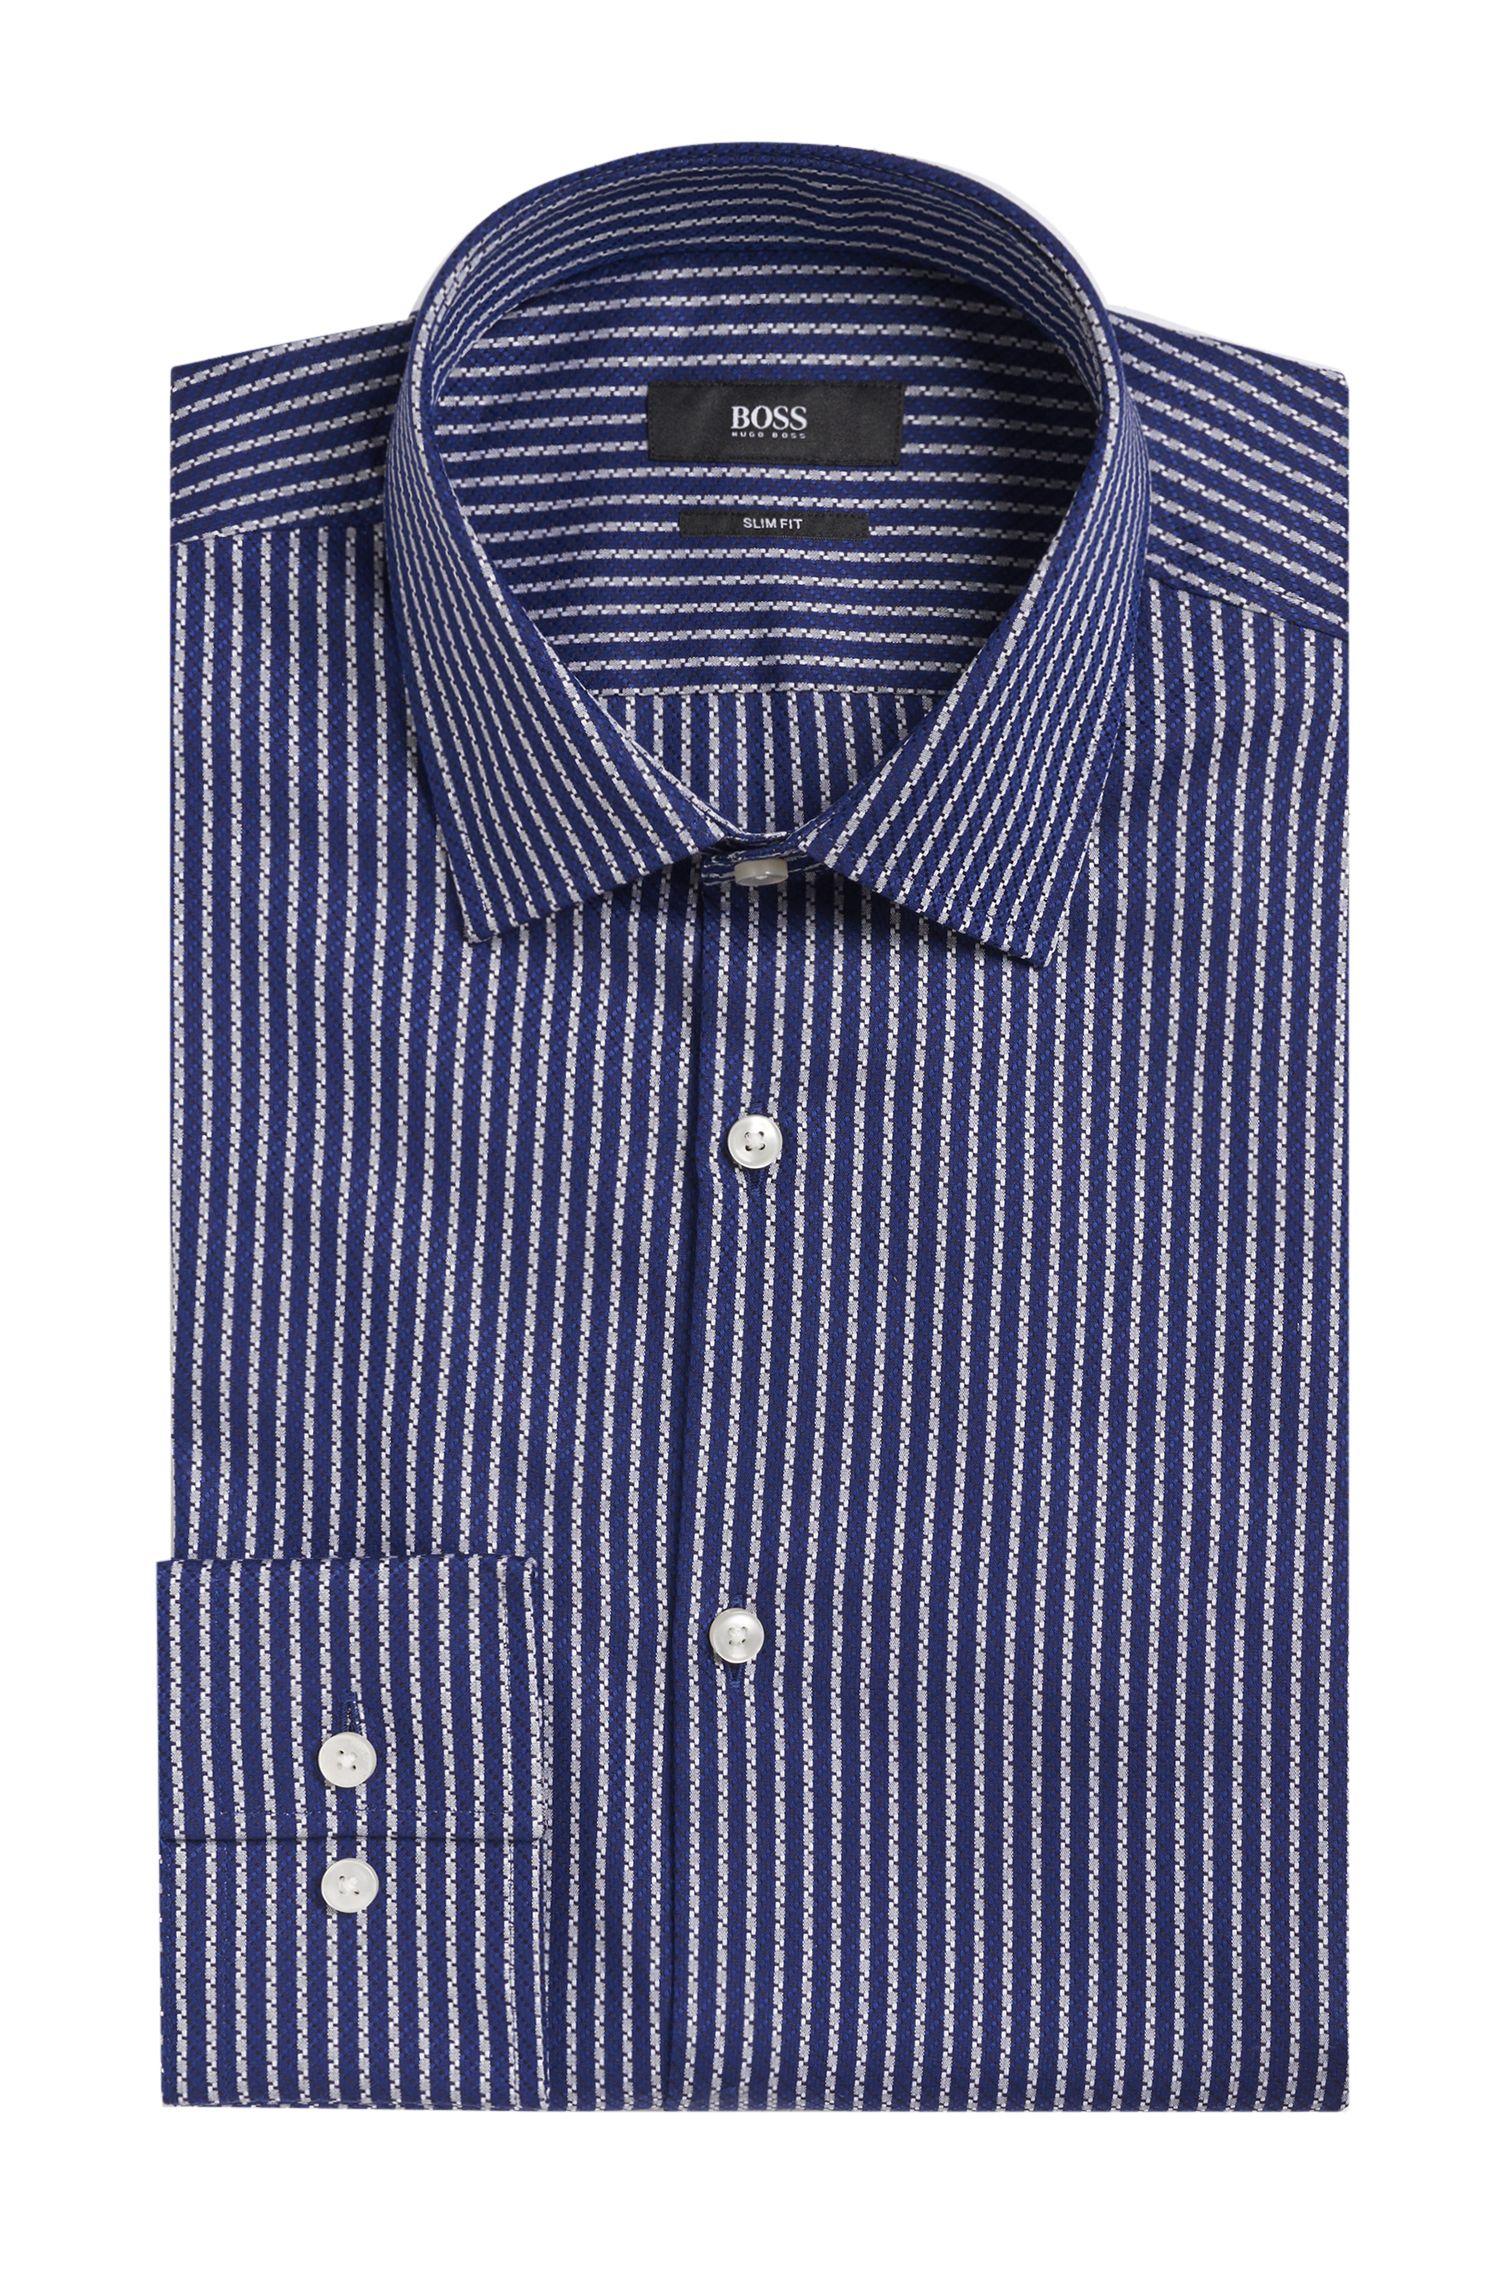 Striped Italian Cotton Dress Shirt, Slim Fit | Jenno